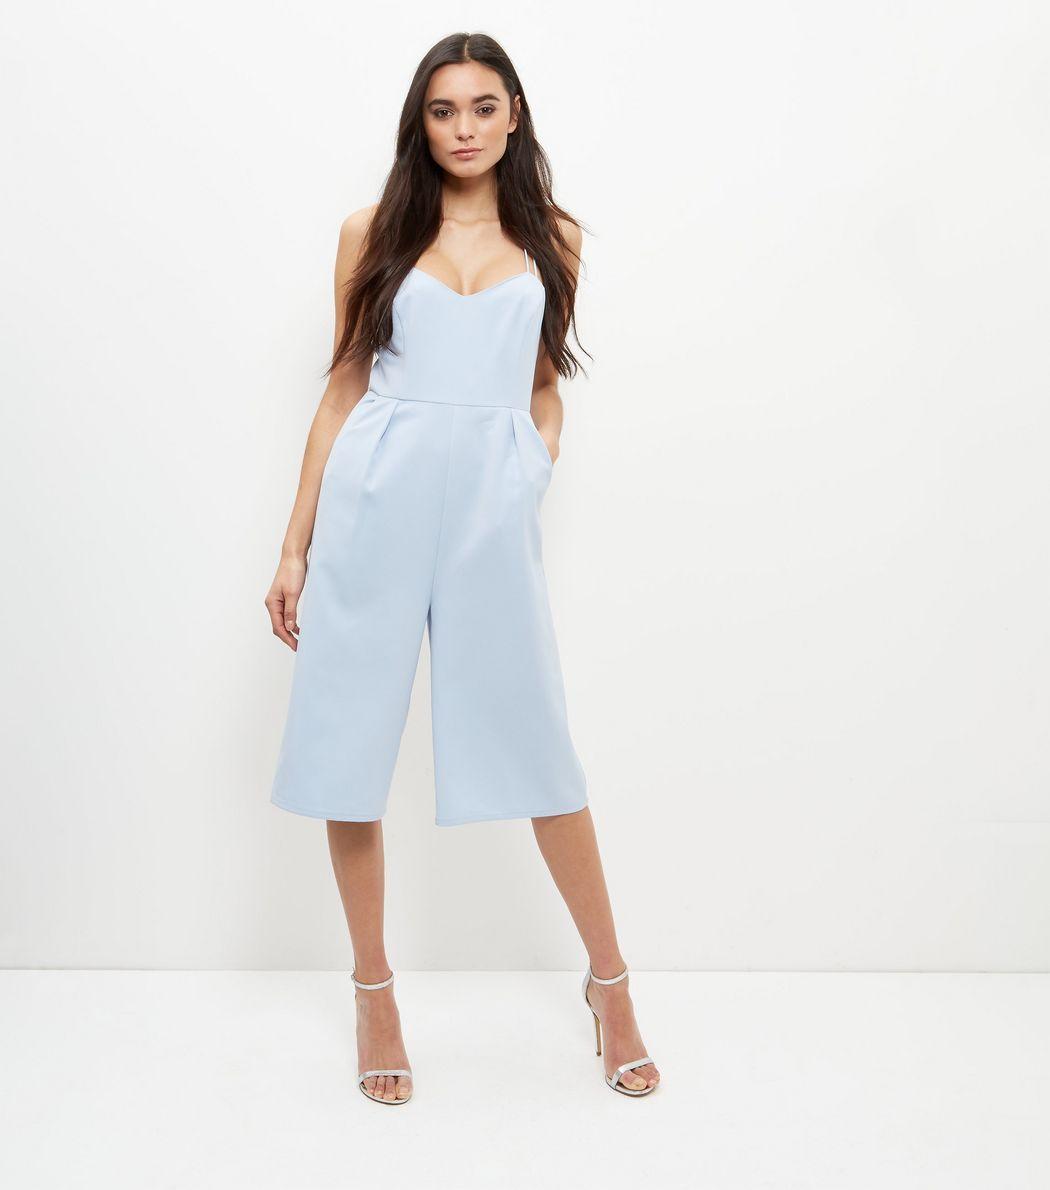 064ba7f6b55 Light Blue Strappy Culotte Jumpsuit